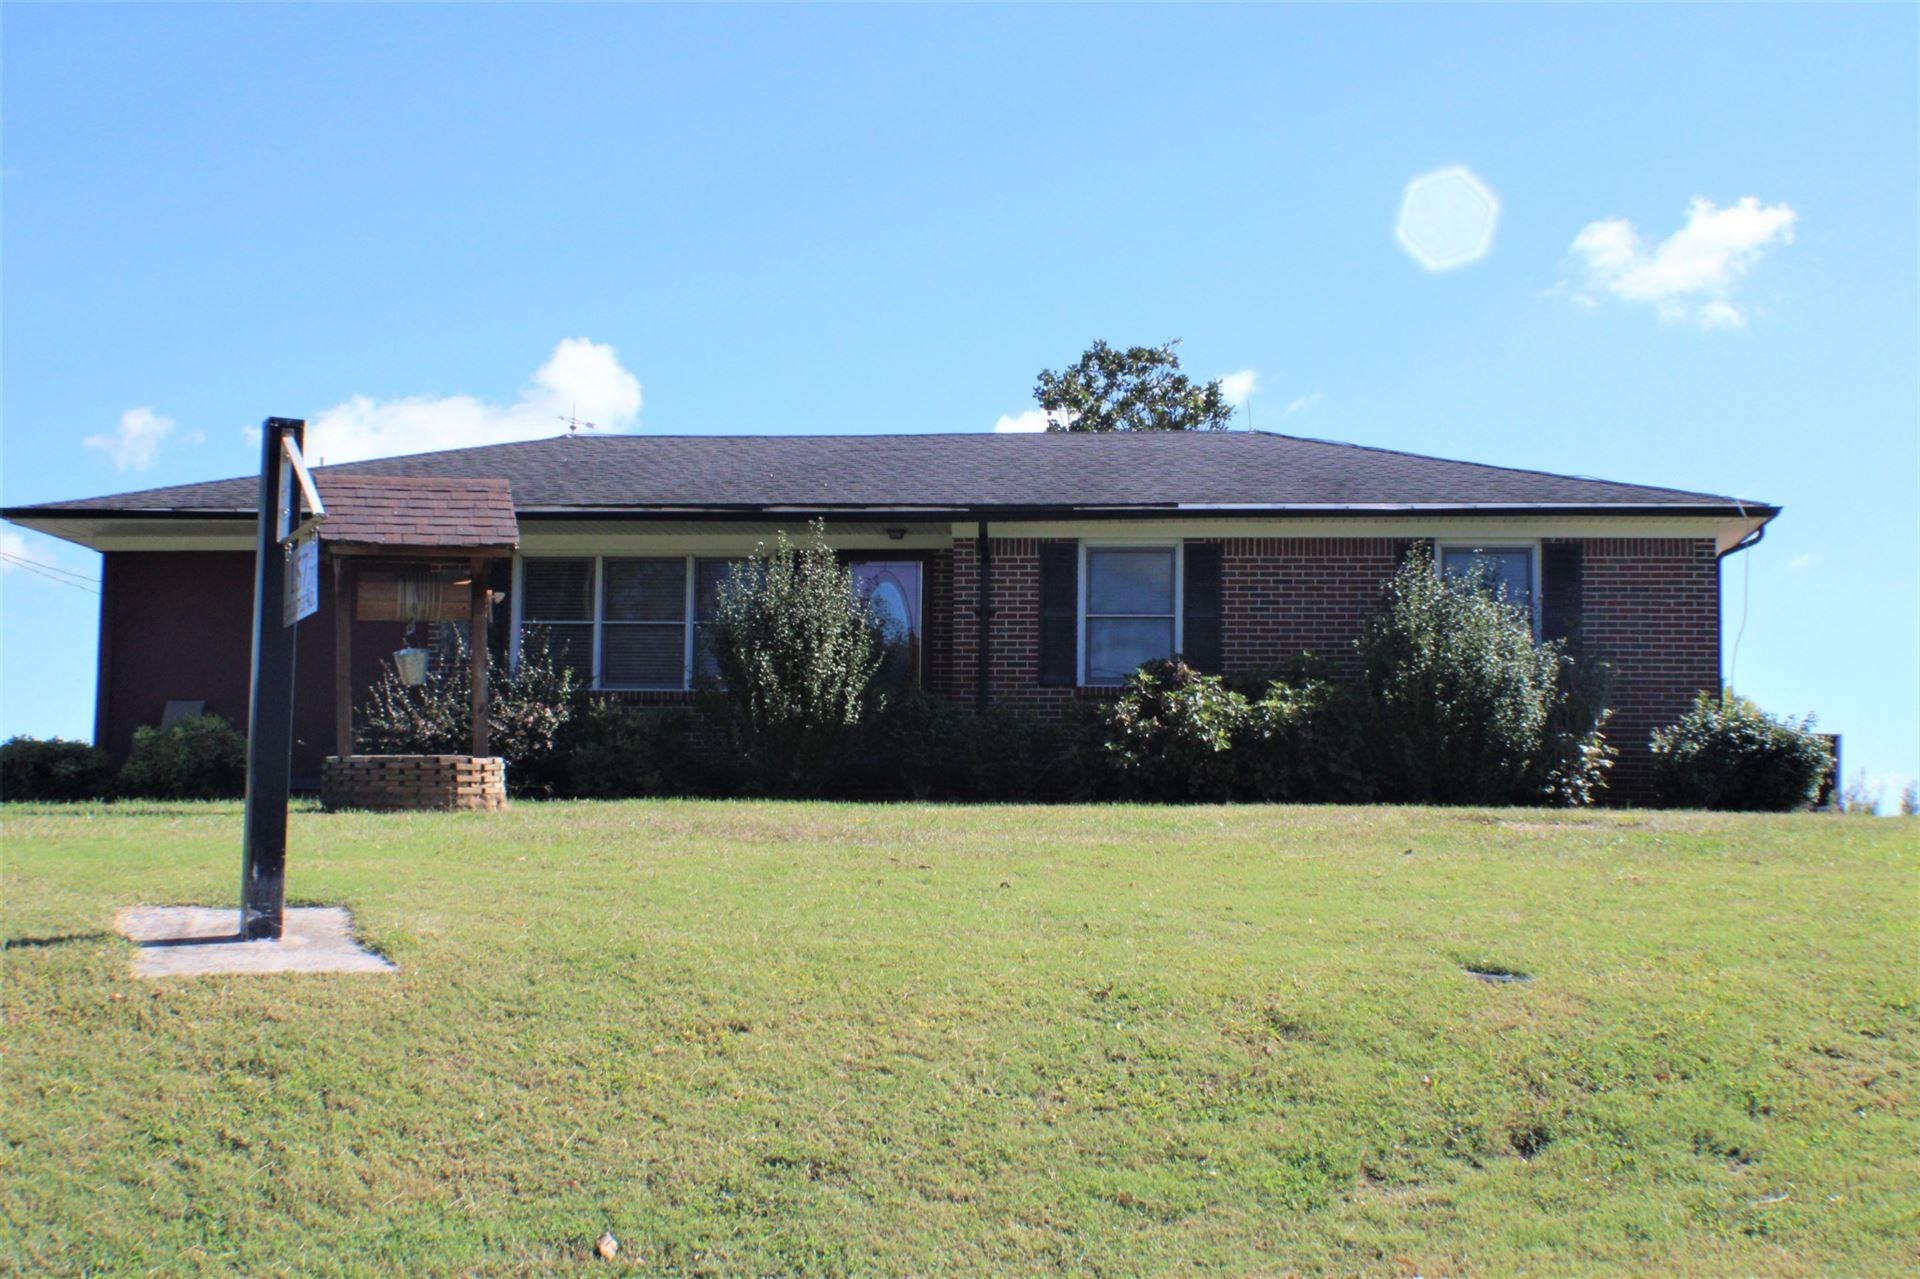 157 Gilispie Rd, McMinnville, TN 37110 - MLS#: 2196037